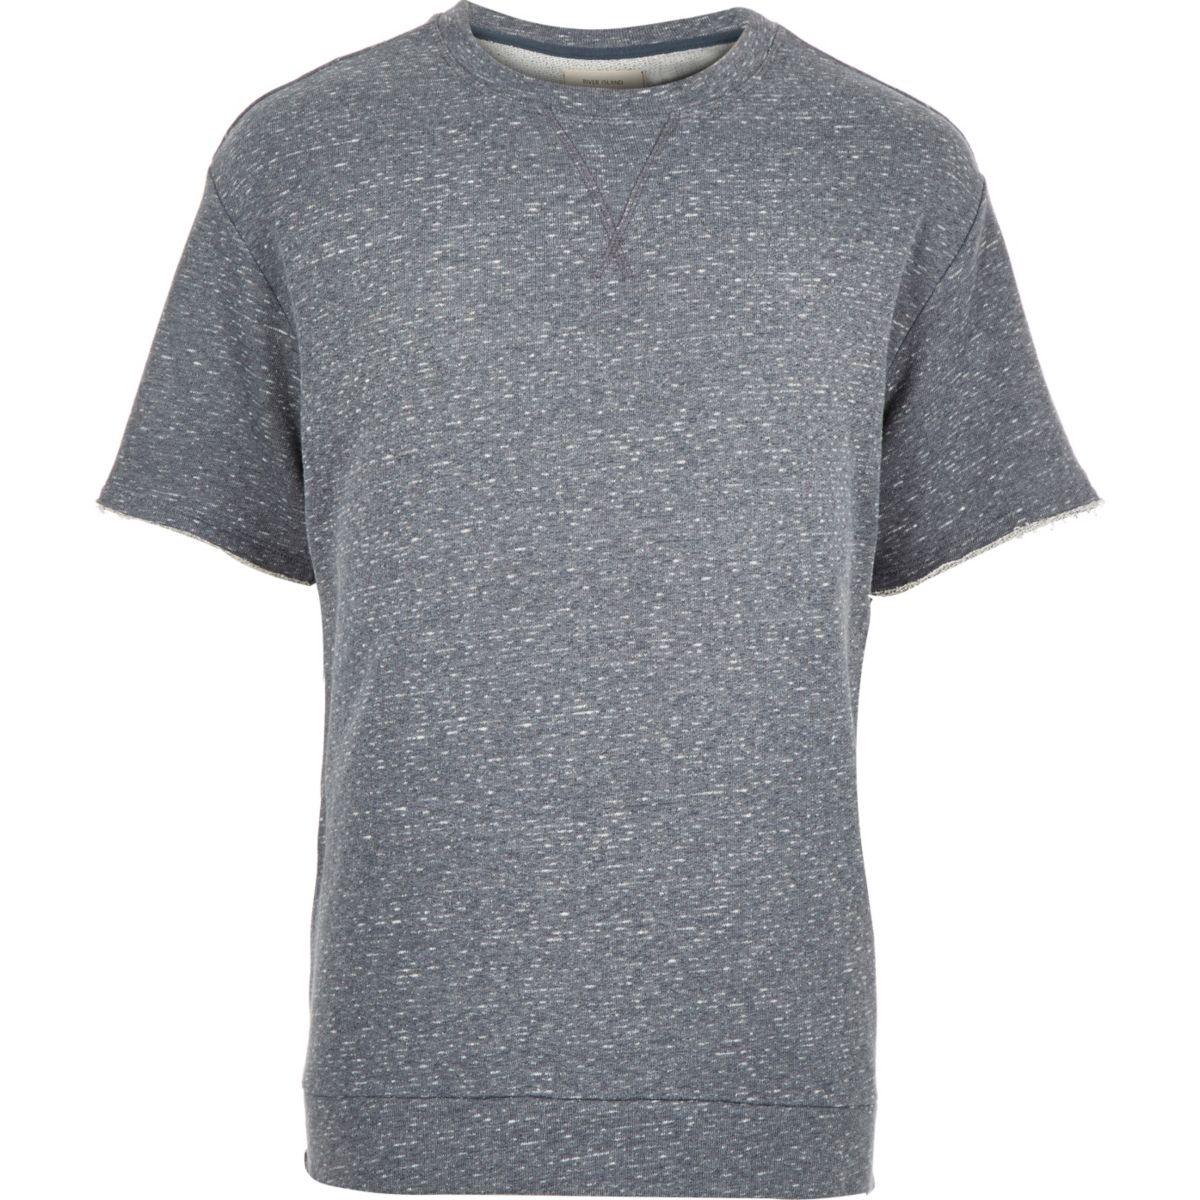 Blue loopback short sleeve sweatshirt